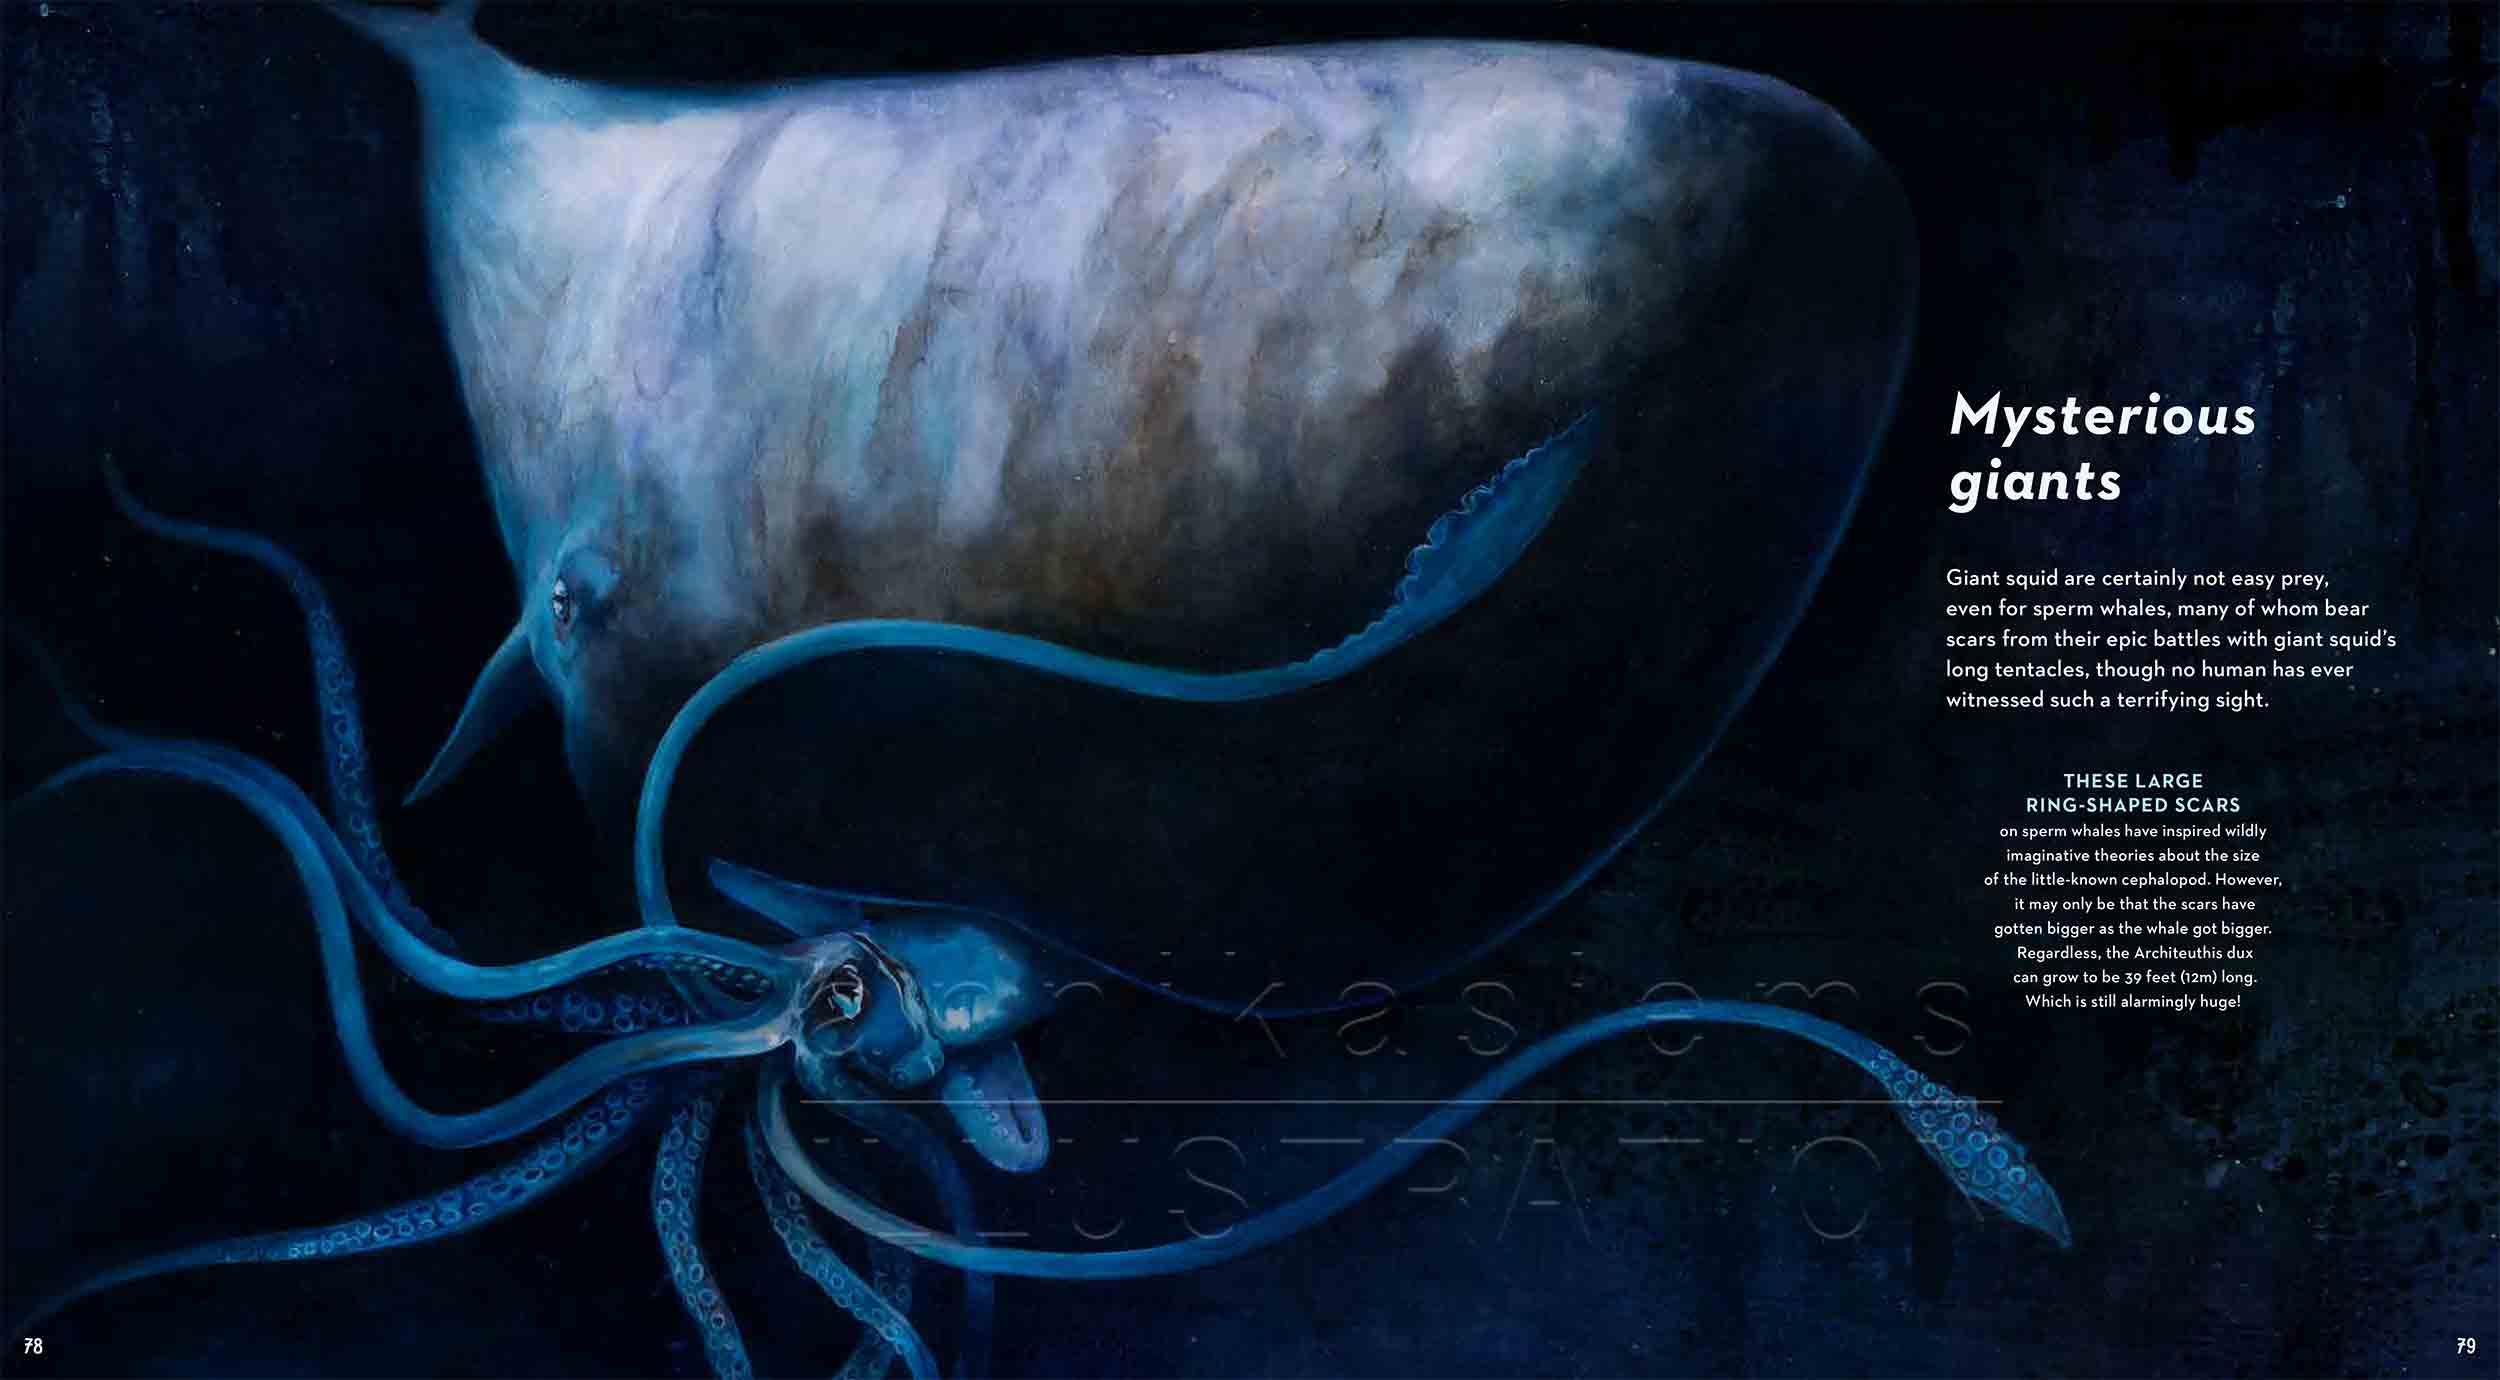 78-79-spermwhale-giantsquid-deep-sea-Englisch-submersible-©annikasiems-plankton_deepsea-zooplankton.jpg